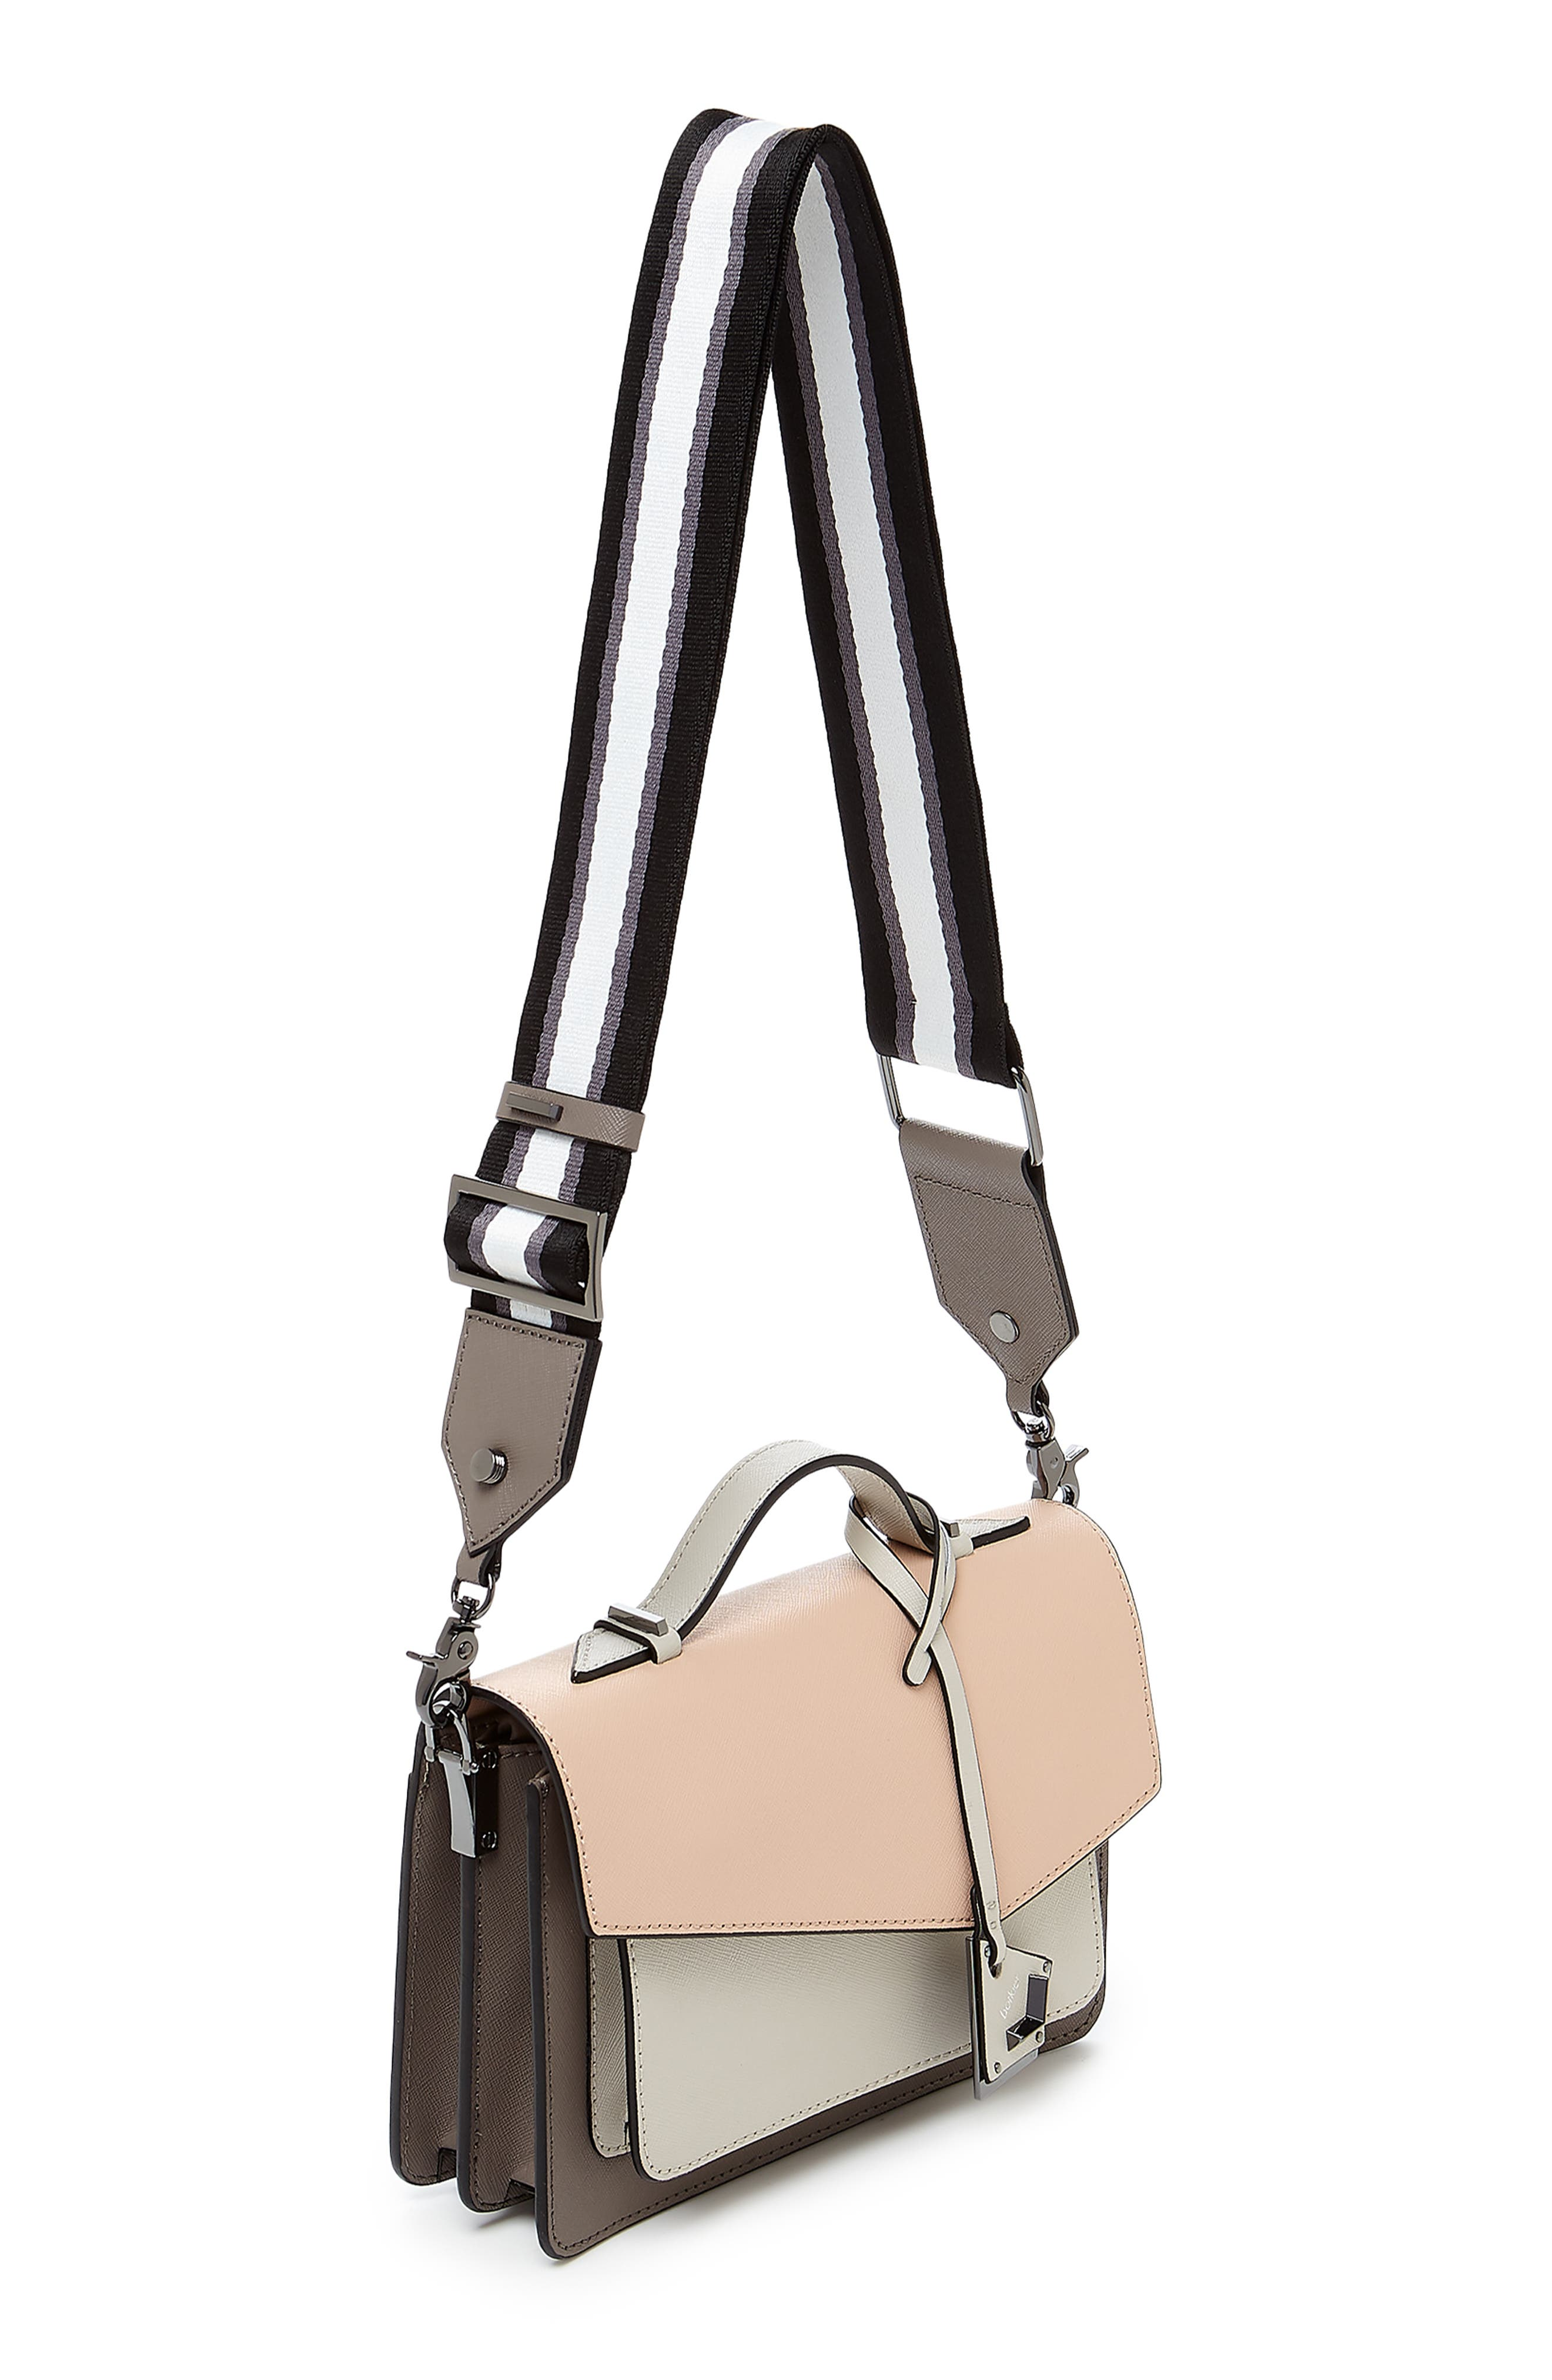 Cobble Hill Calfskin Leather Crossbody Bag,                             Alternate thumbnail 5, color,                             NUDE COMBO